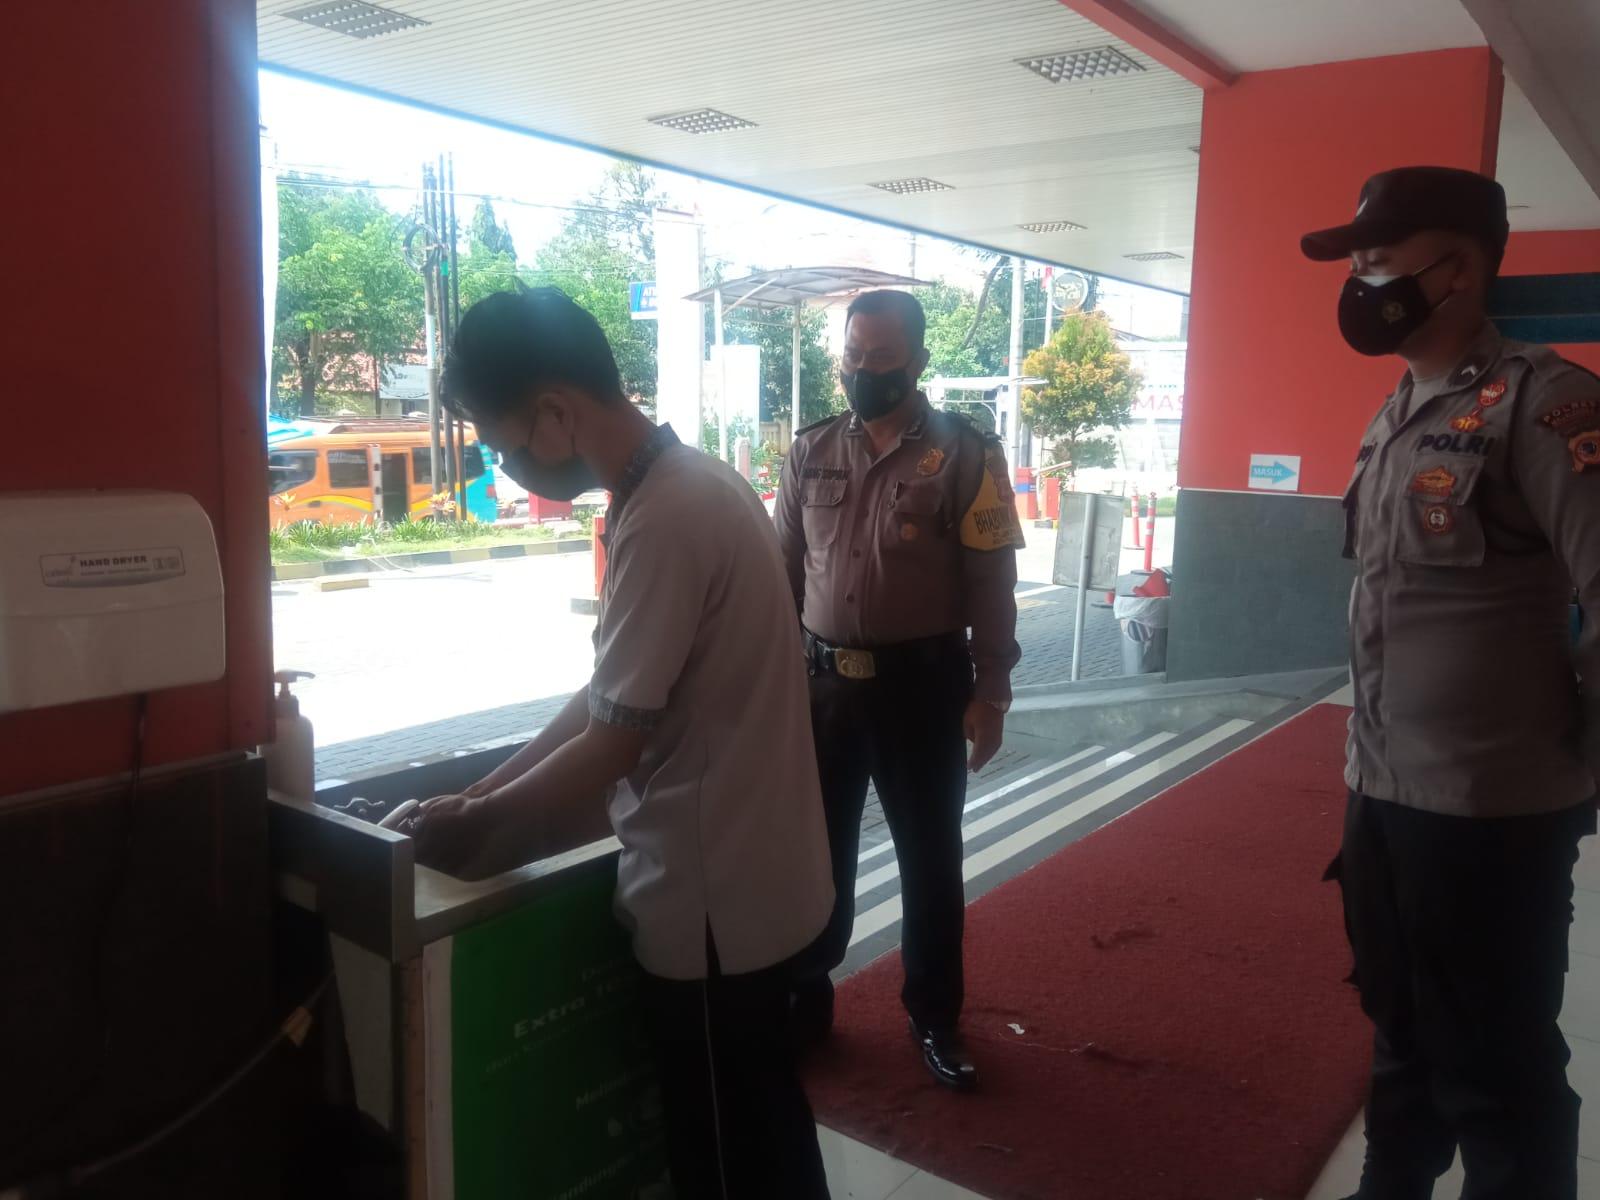 Petugas Posko PPKM Terus Imbau Prokes di Toserba Yogya Majalengka